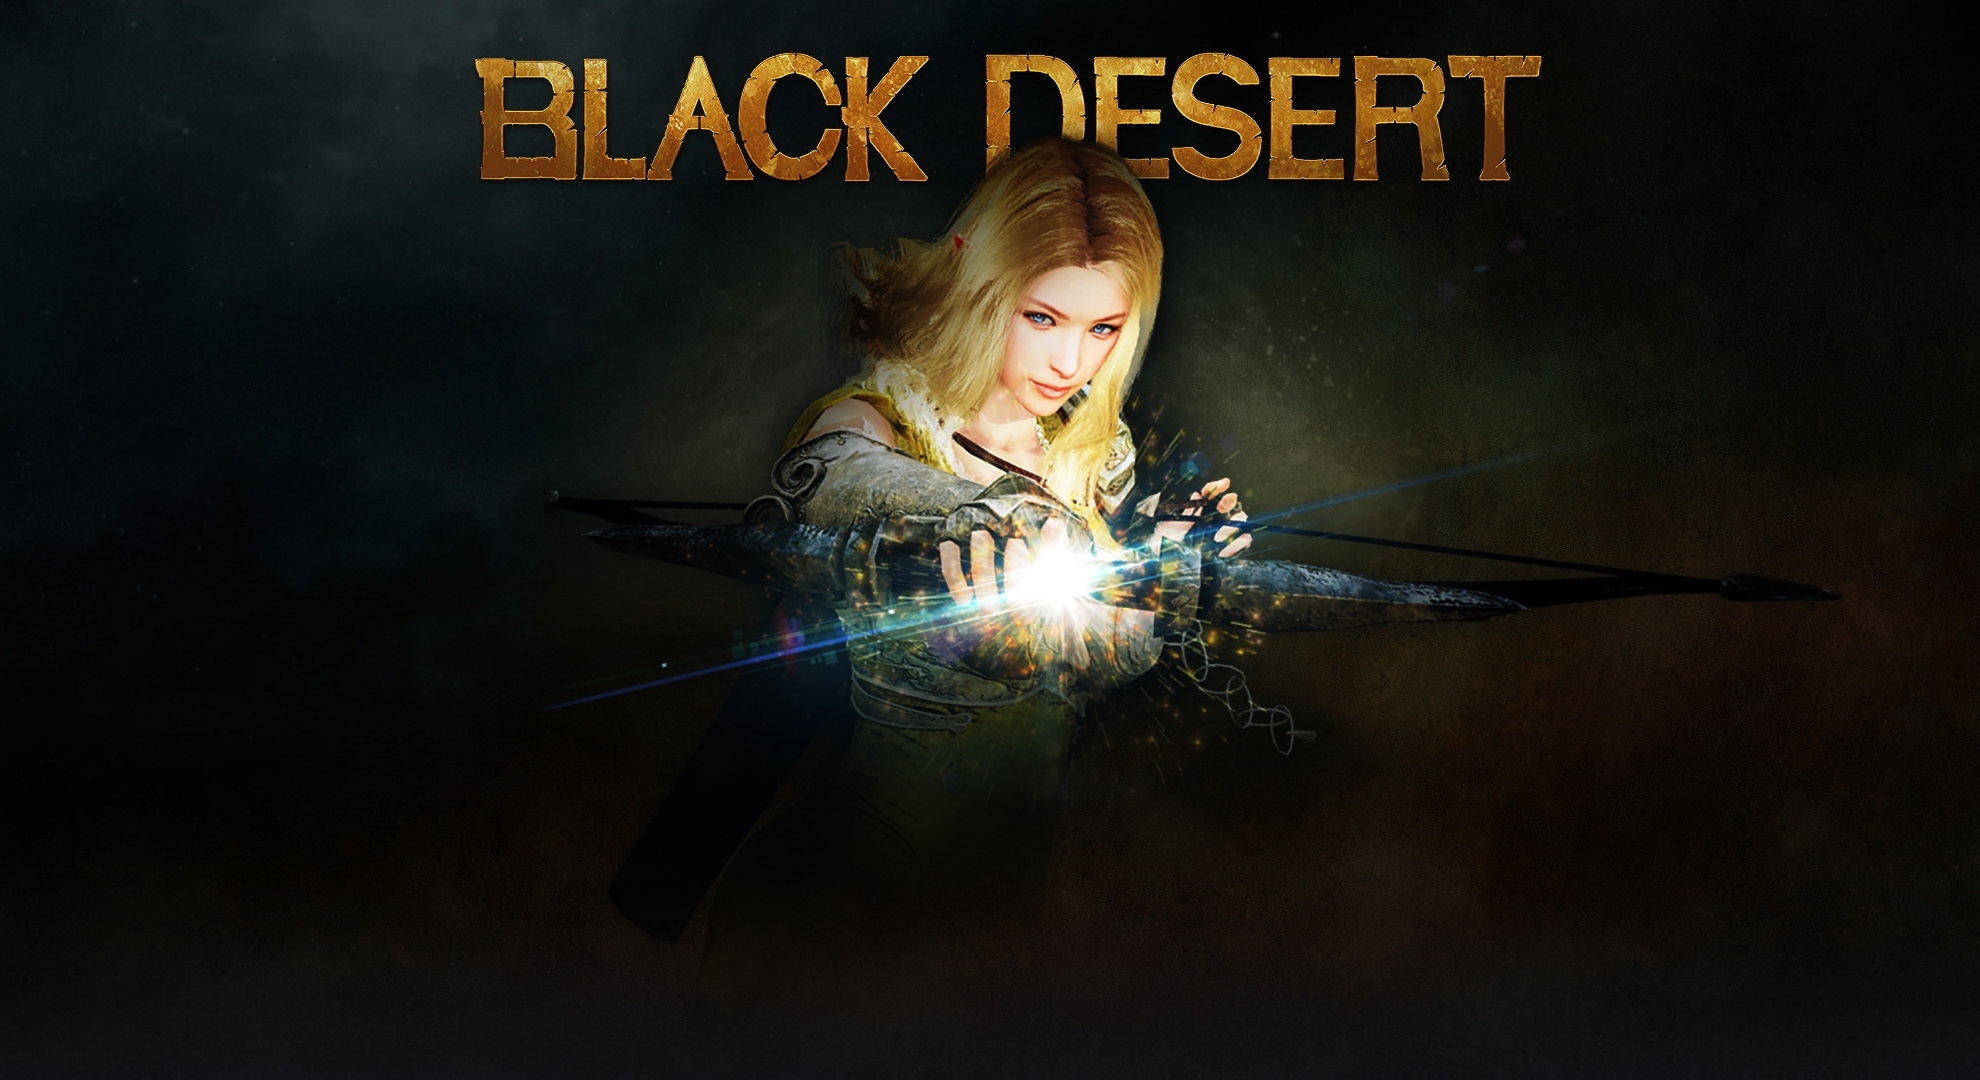 black desert online trouve une date de sortie européenne - 4wearegamers